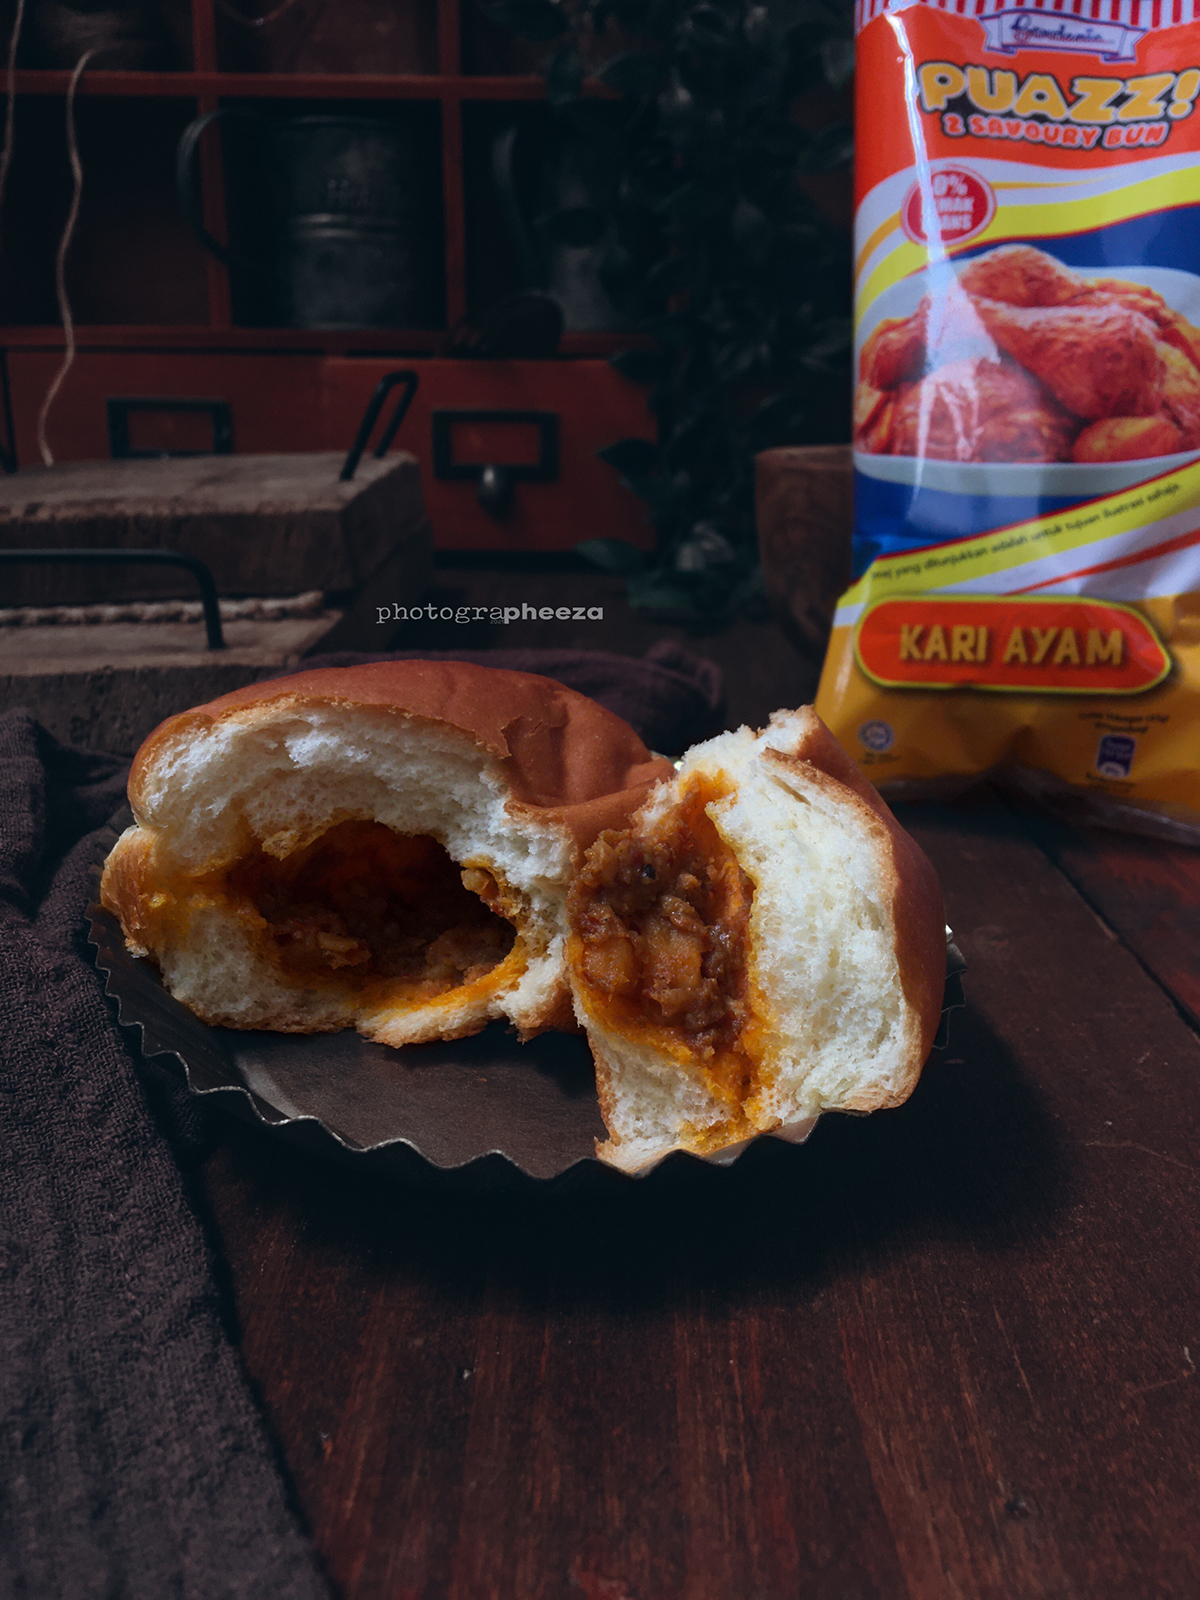 Roti Grrdenia Puazz Kari Ayam